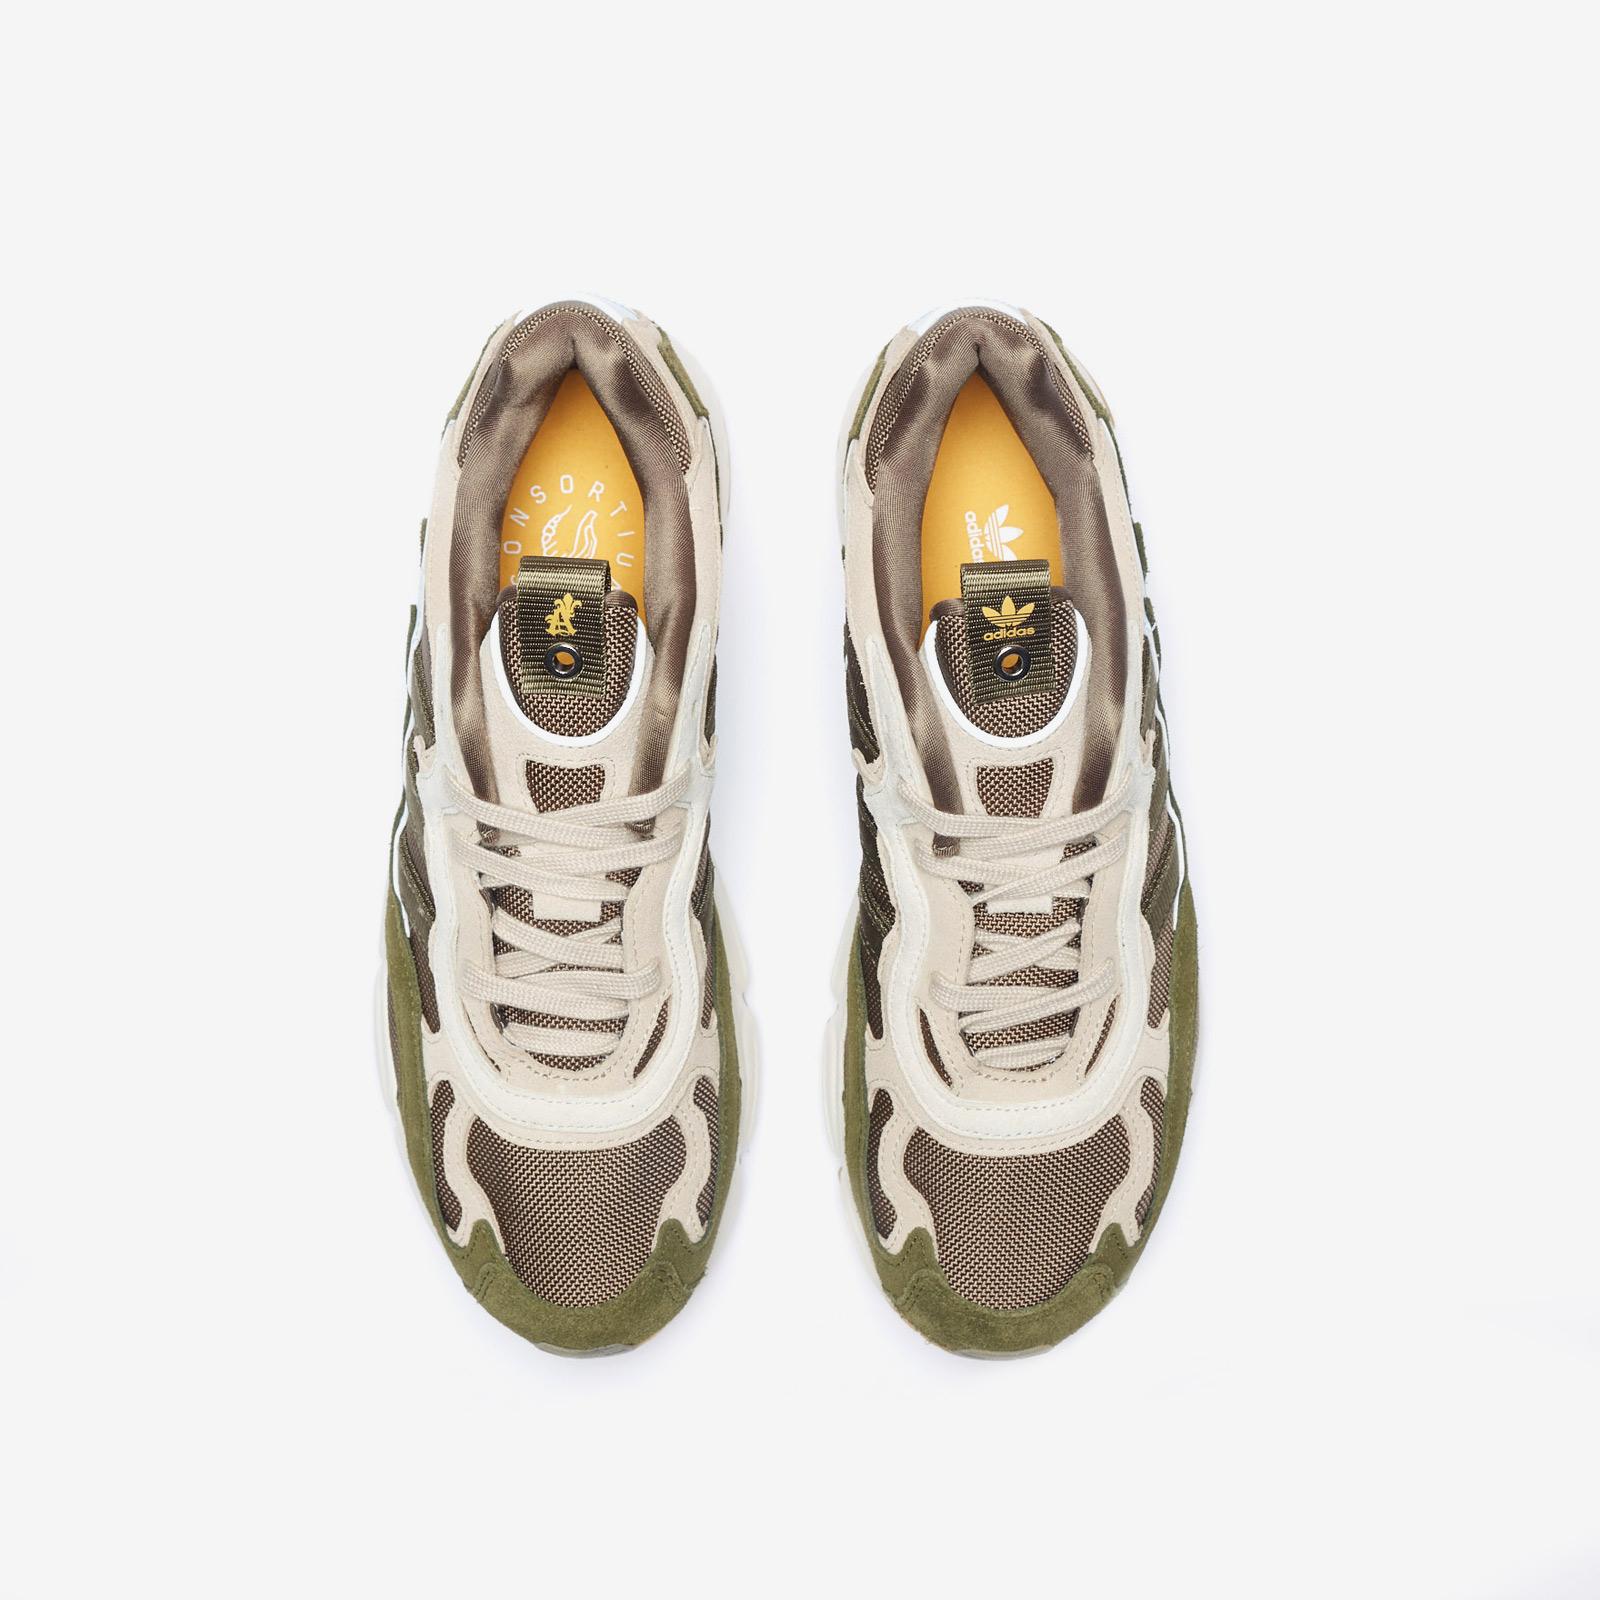 new product b0fdb 2eafc adidas Consortium Temper Run x St. Alfred - 7. Close